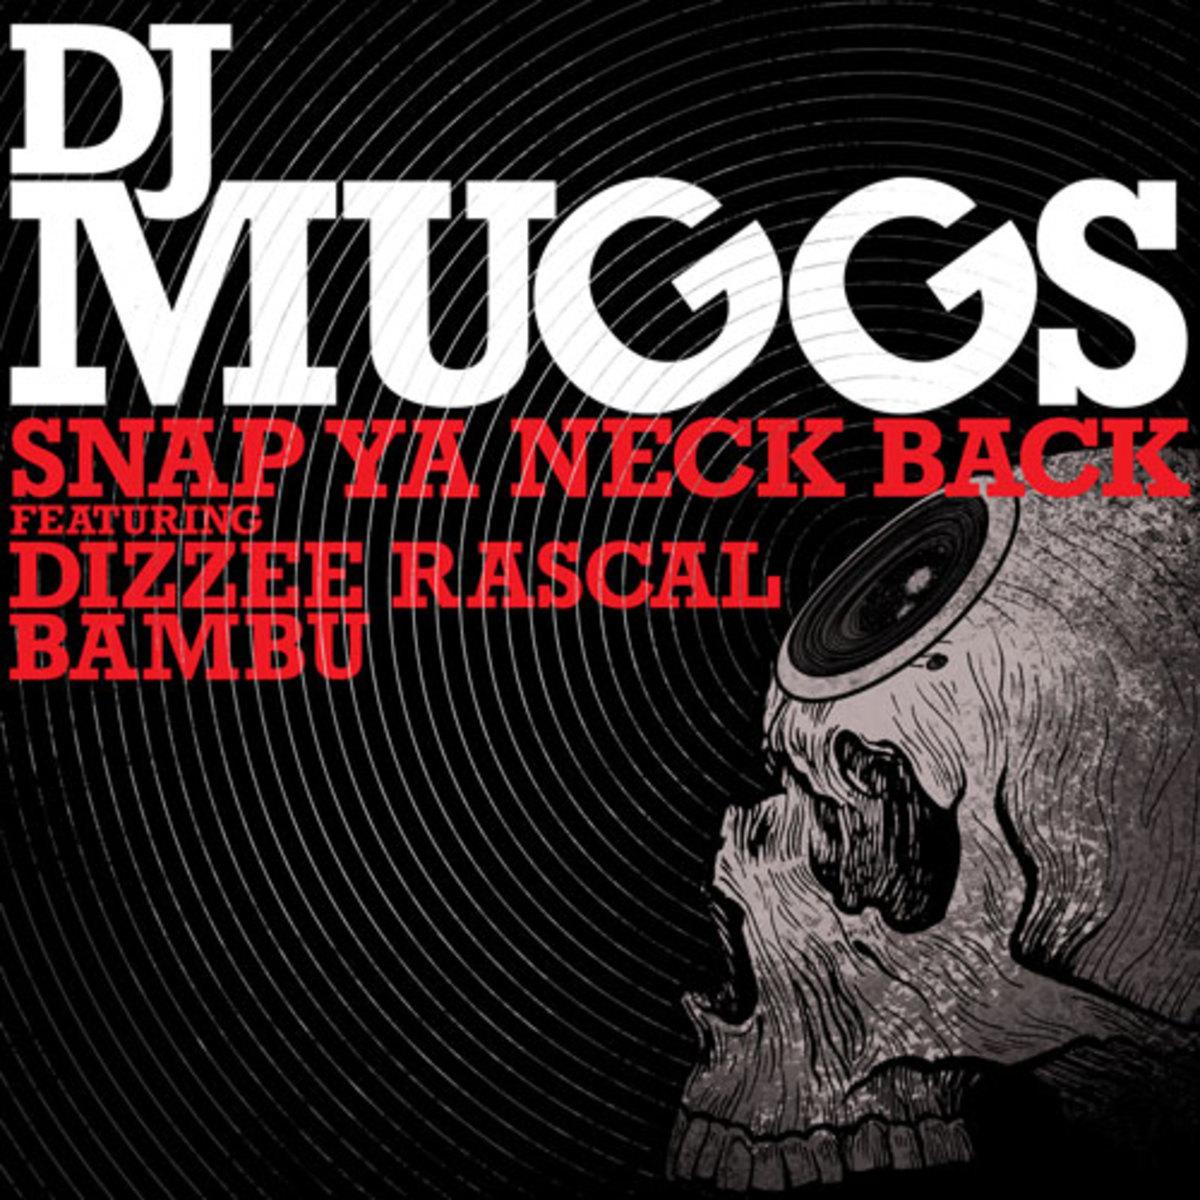 muggs-snapyaneckback.jpg